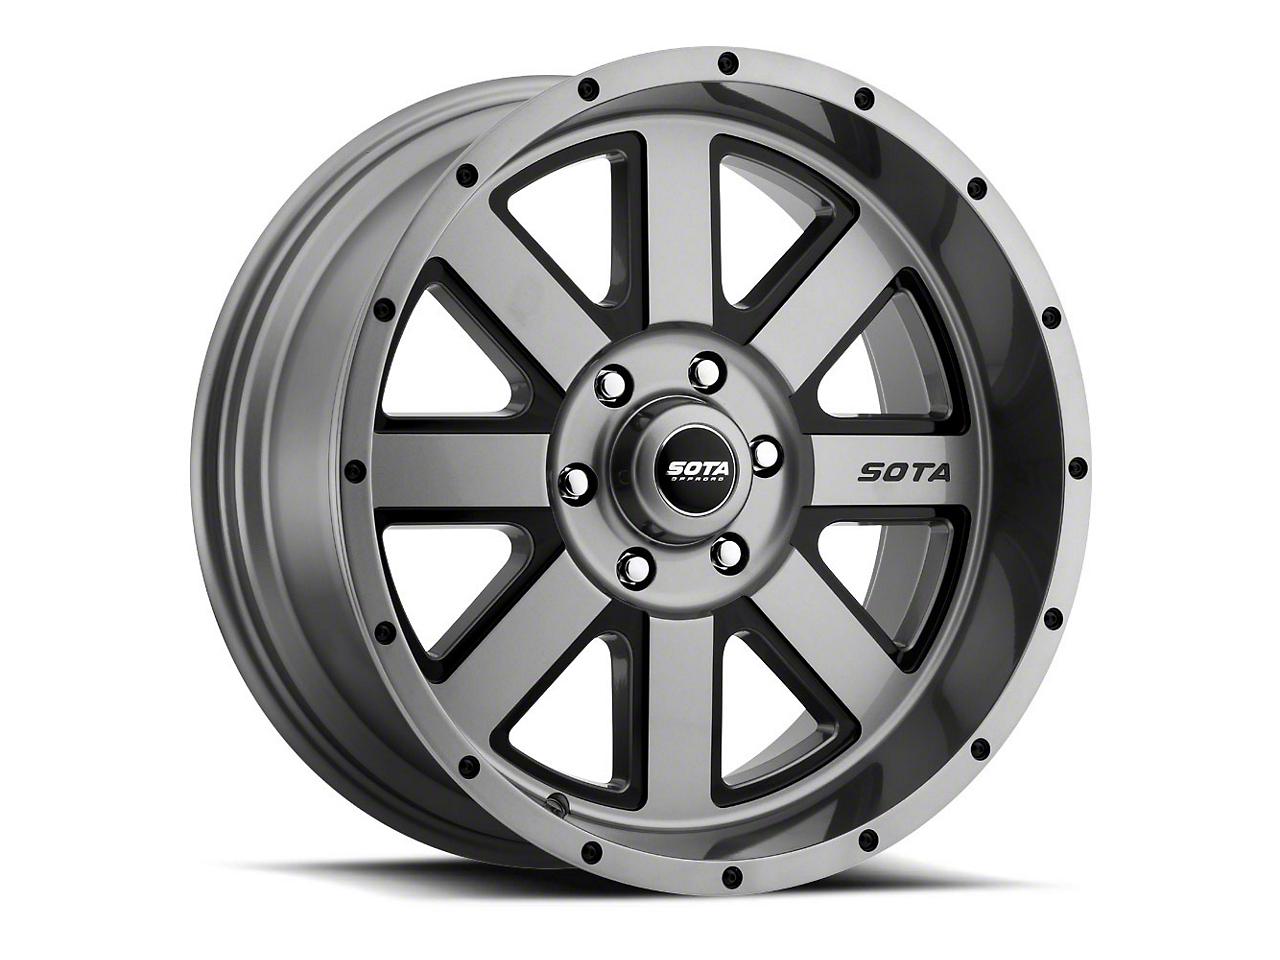 SOTA Off Road A.W.O.L. Anthra-Kote Black Wheels (07-18 Wrangler JK; 2018 Wrangler JL)